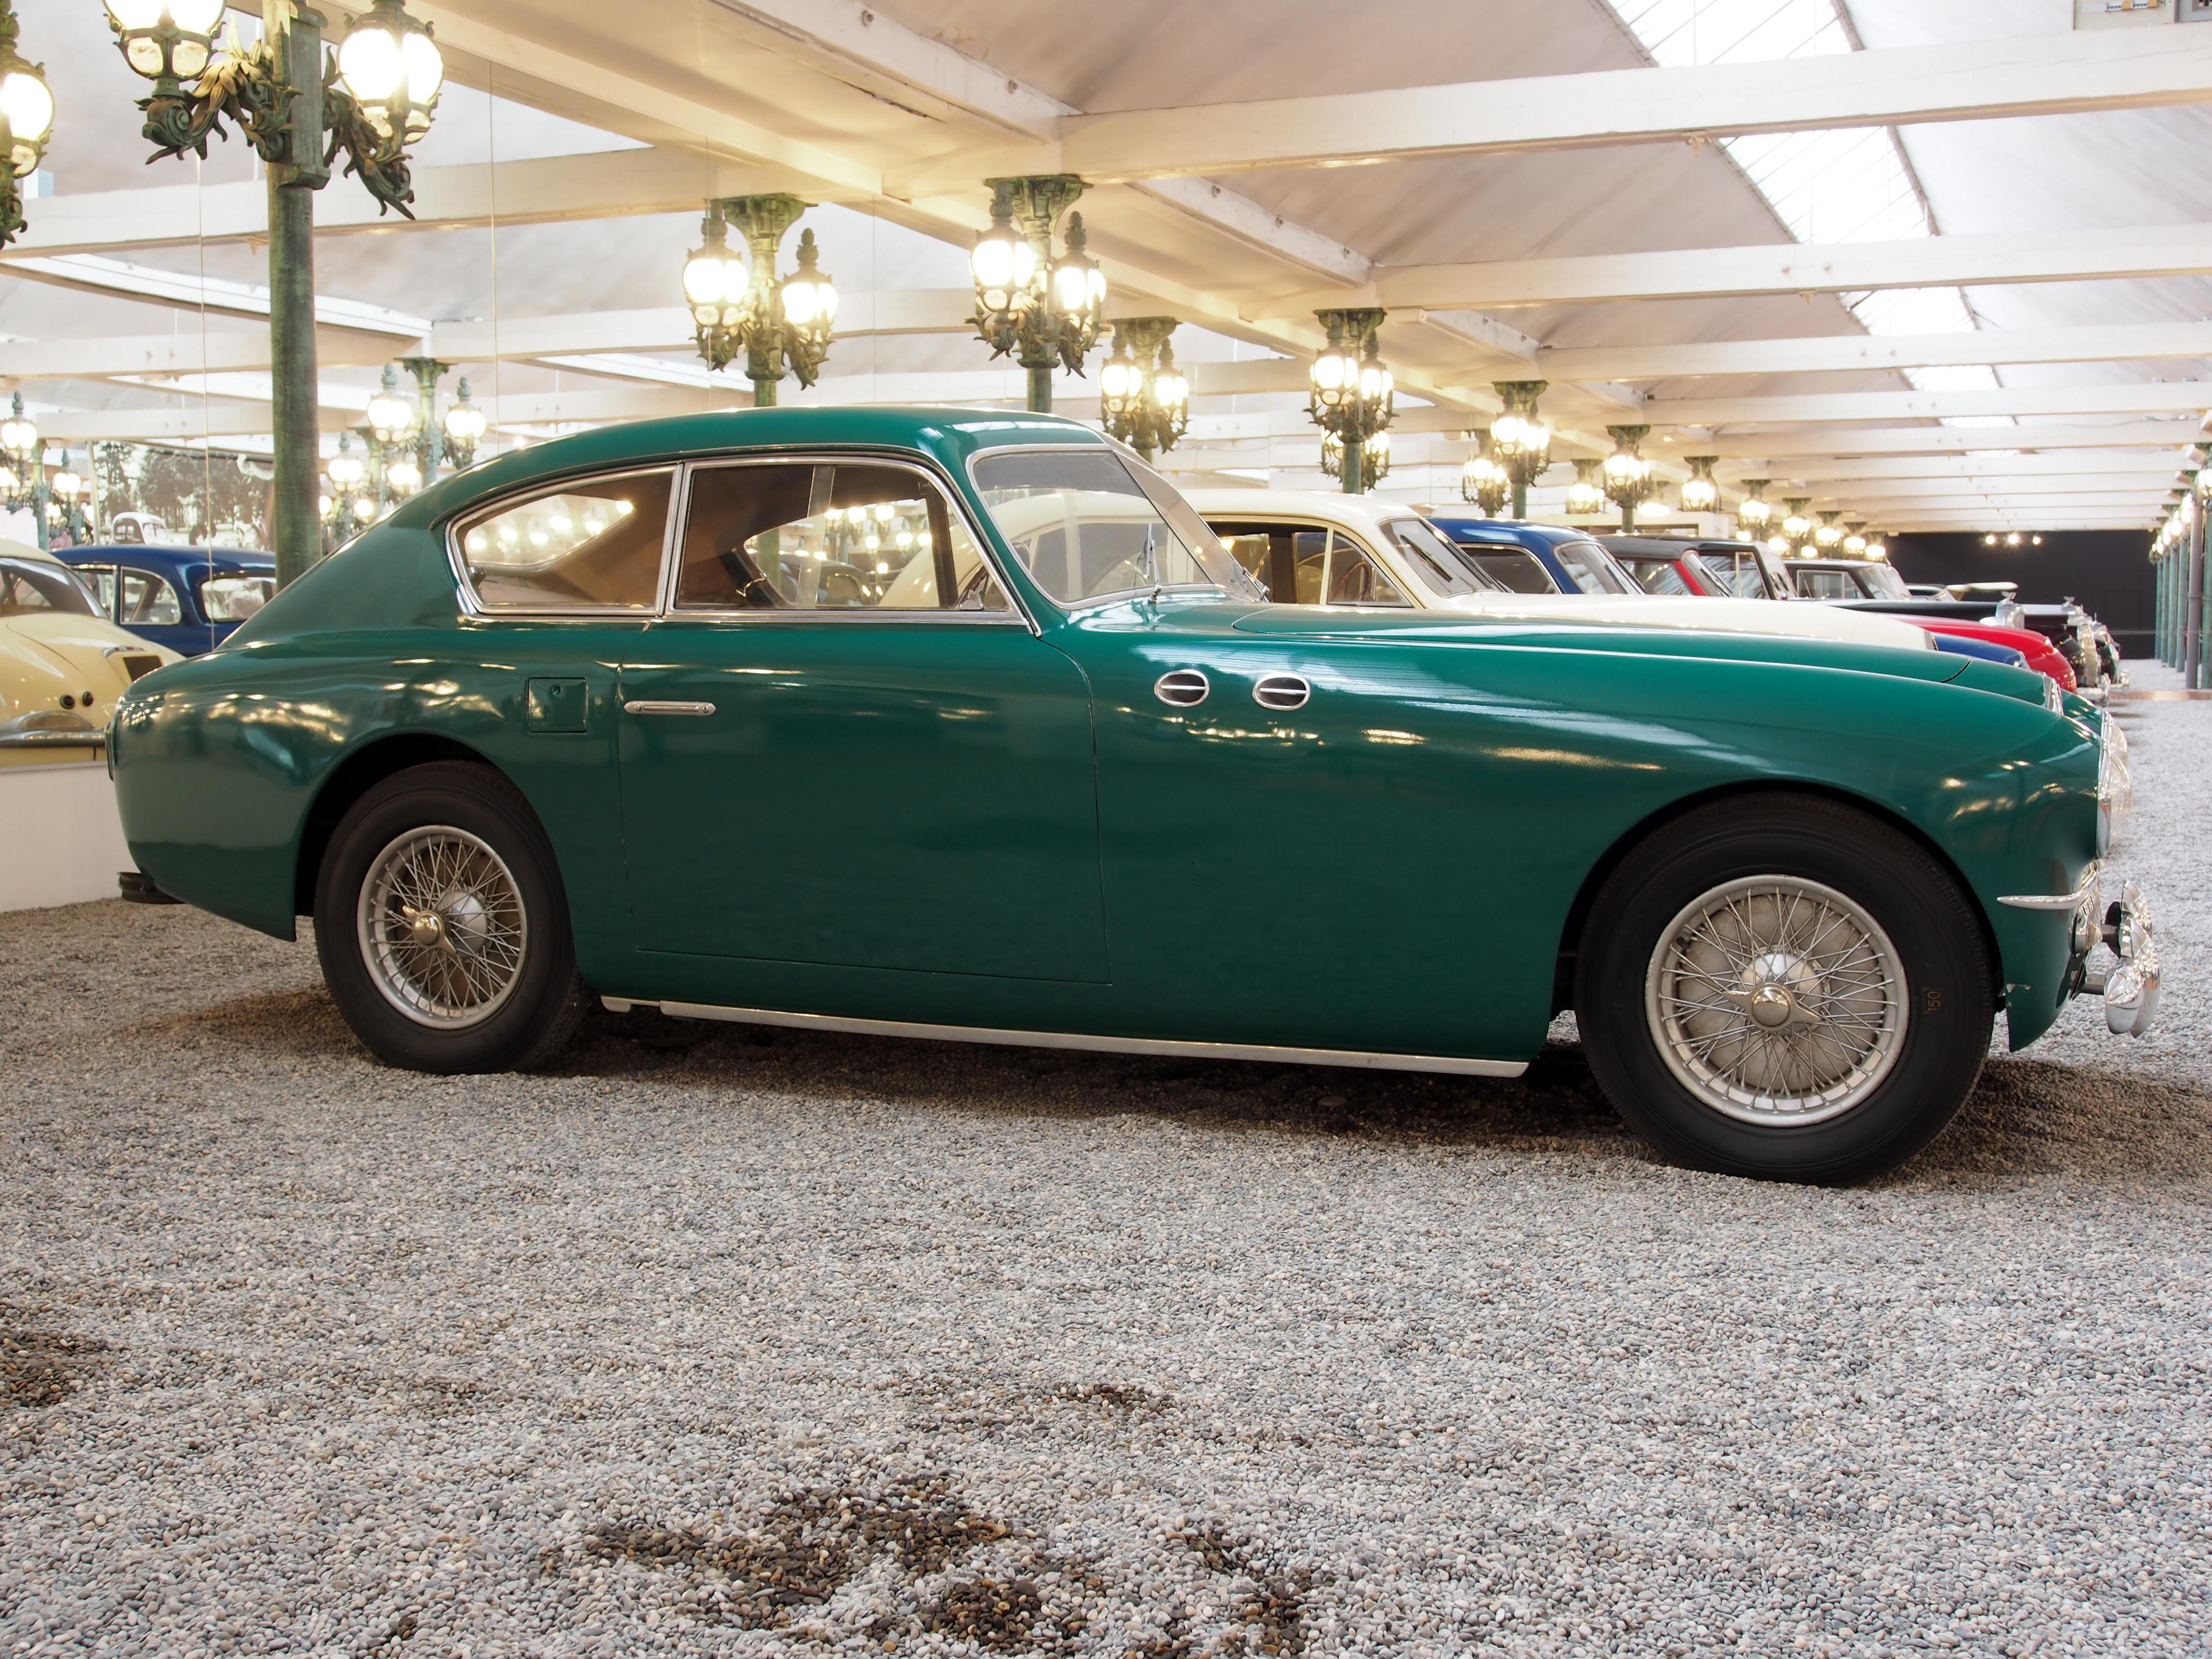 File:1951 Bugatti Type 57SC Ghia, photo 5.JPG - Wikimedia Commons